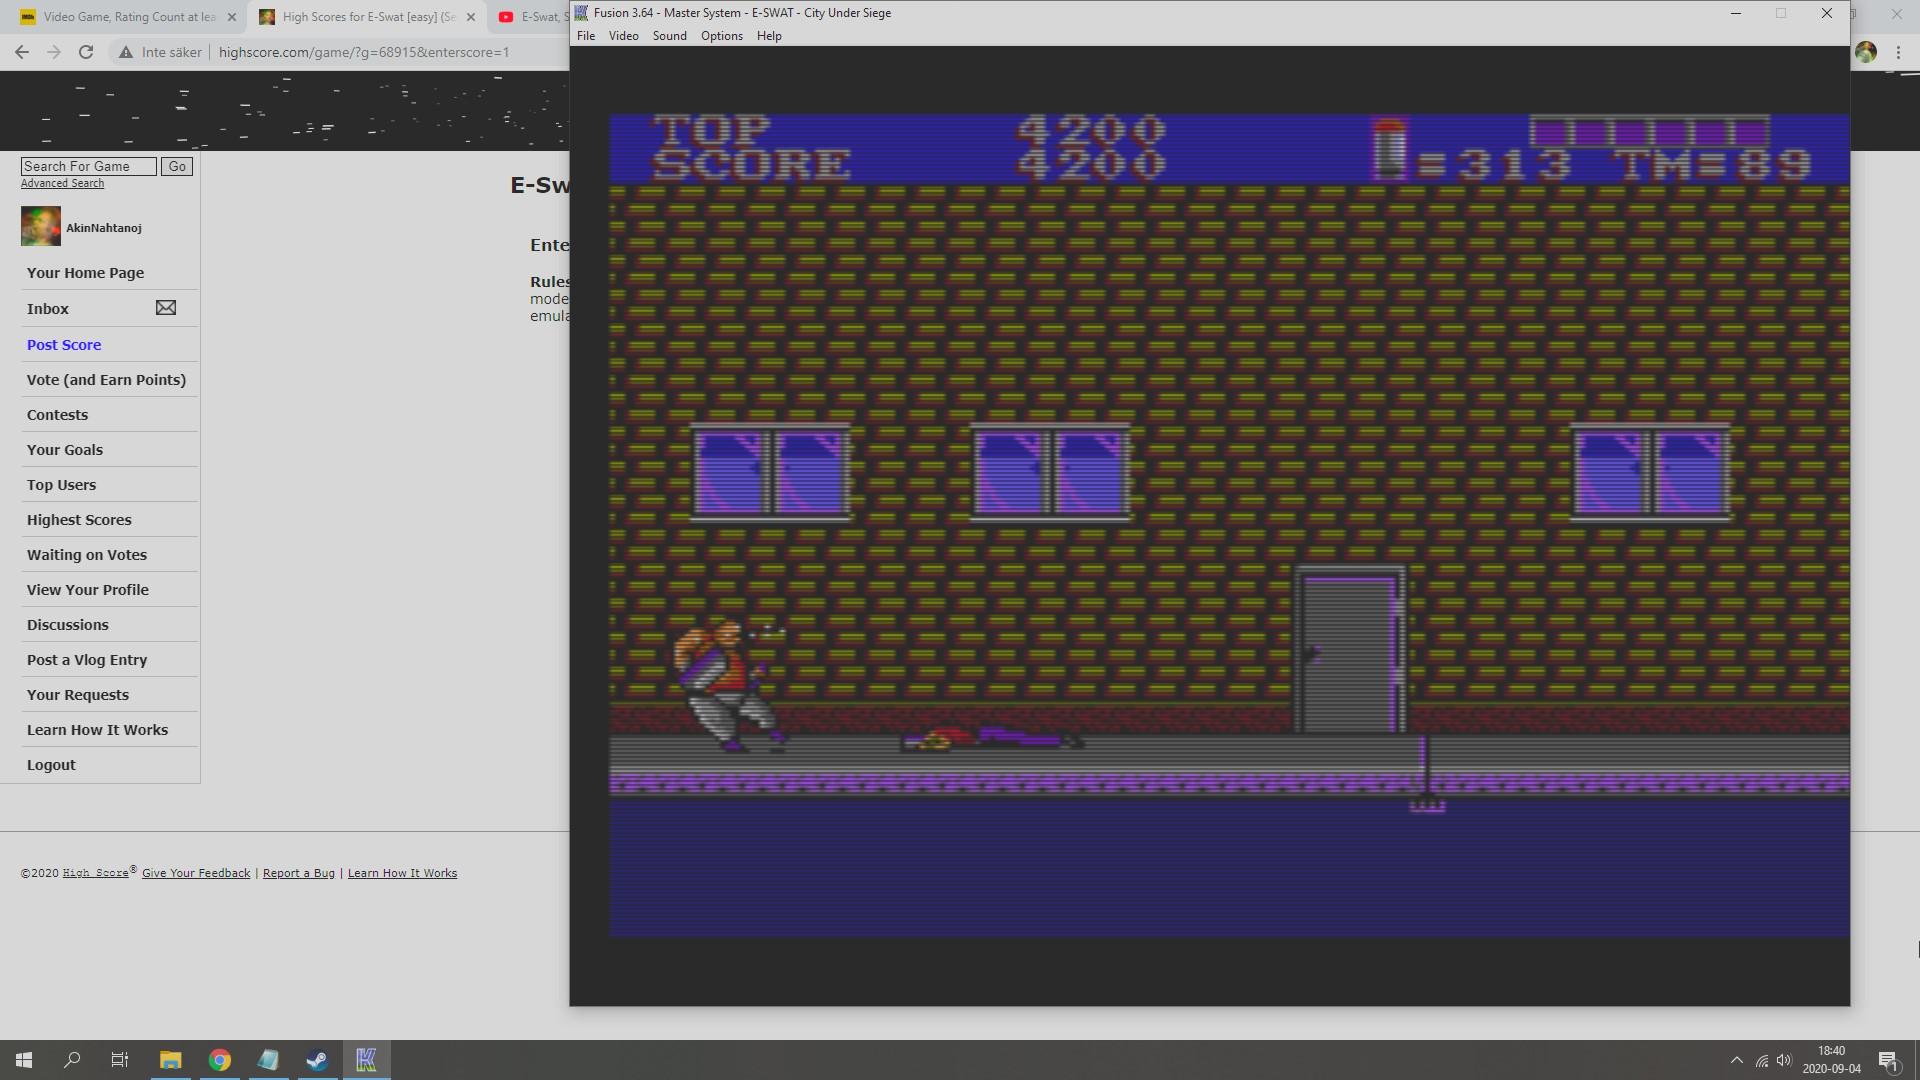 AkinNahtanoj: E-Swat [easy] (Sega Master System Emulated) 4,200 points on 2020-09-04 11:43:32